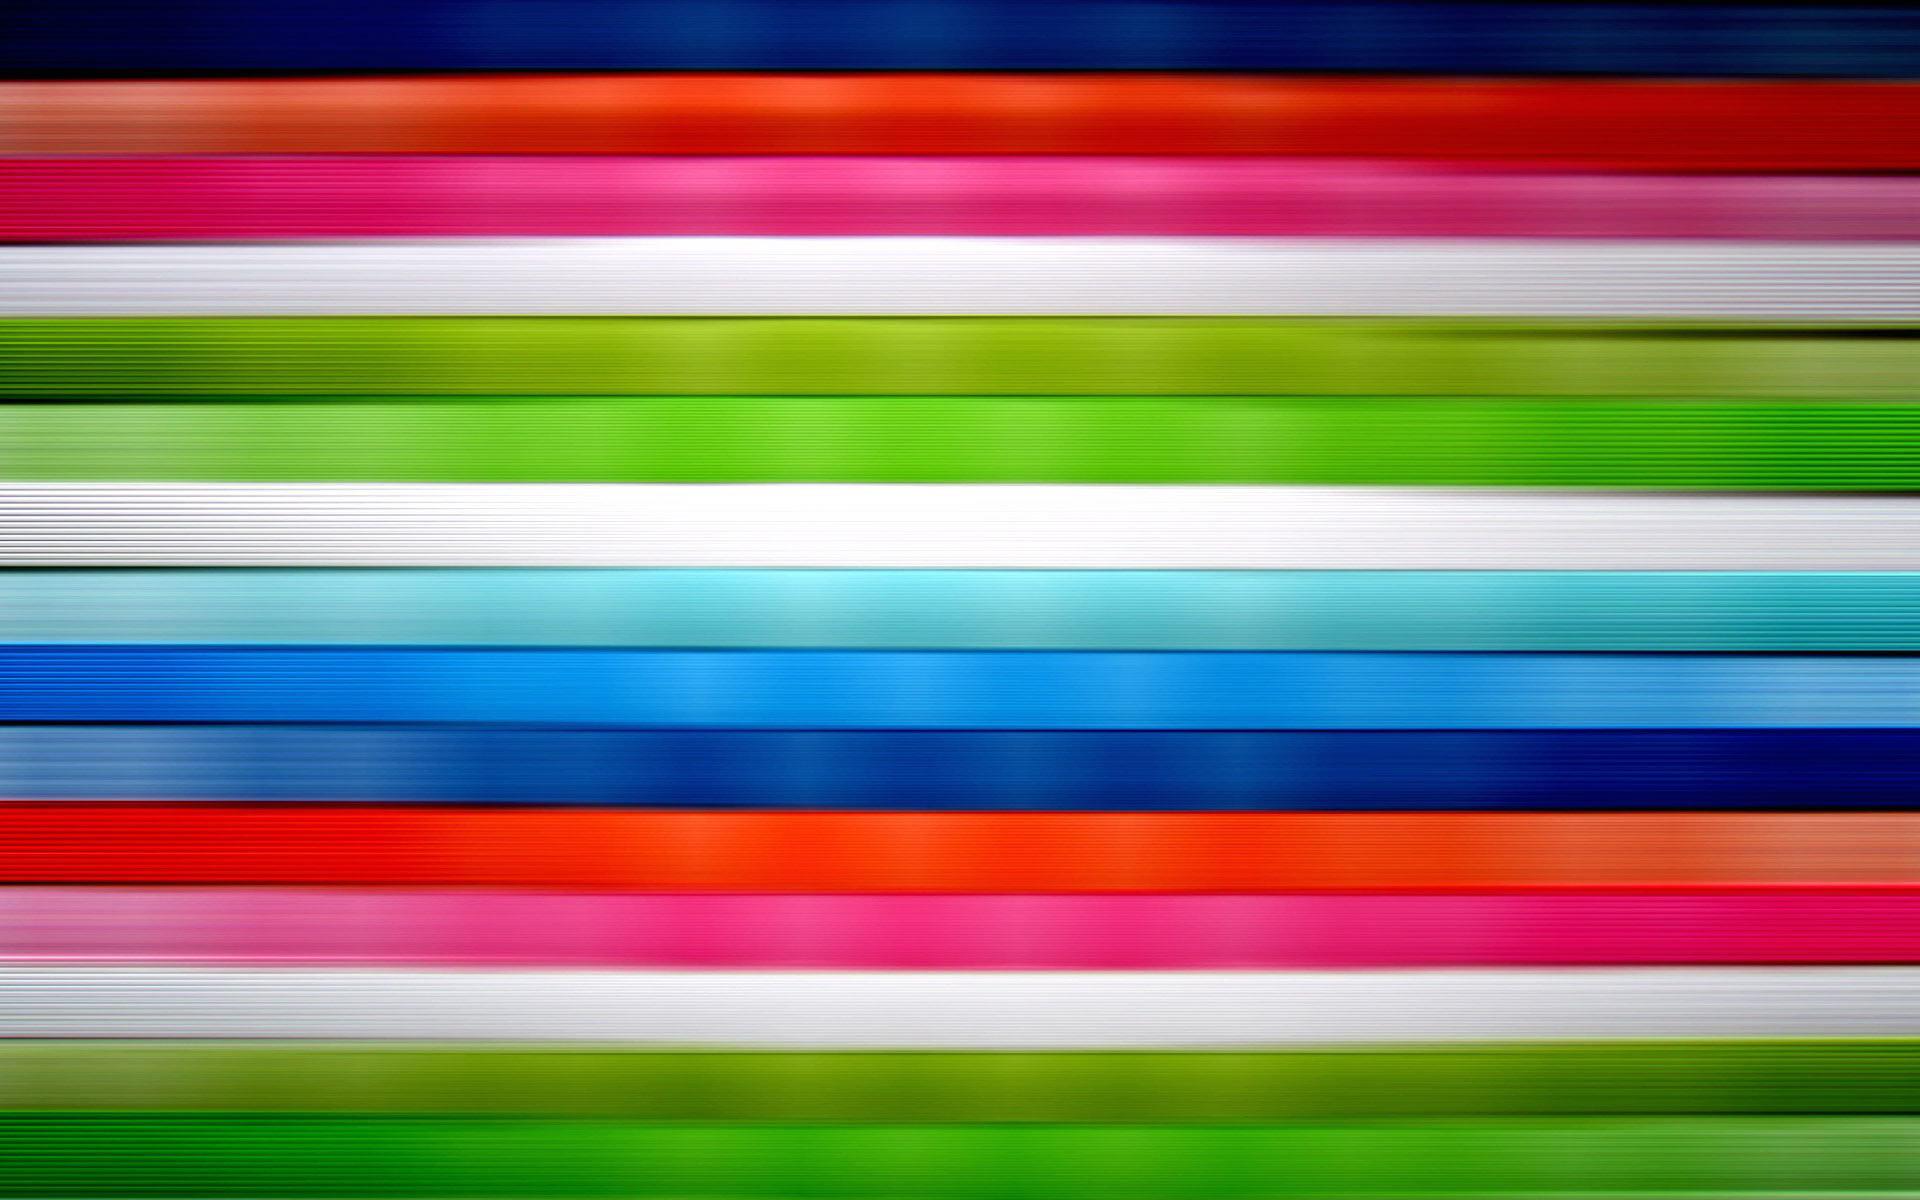 Horizontal vivid colored stripes wallpaper 201 1920x1200